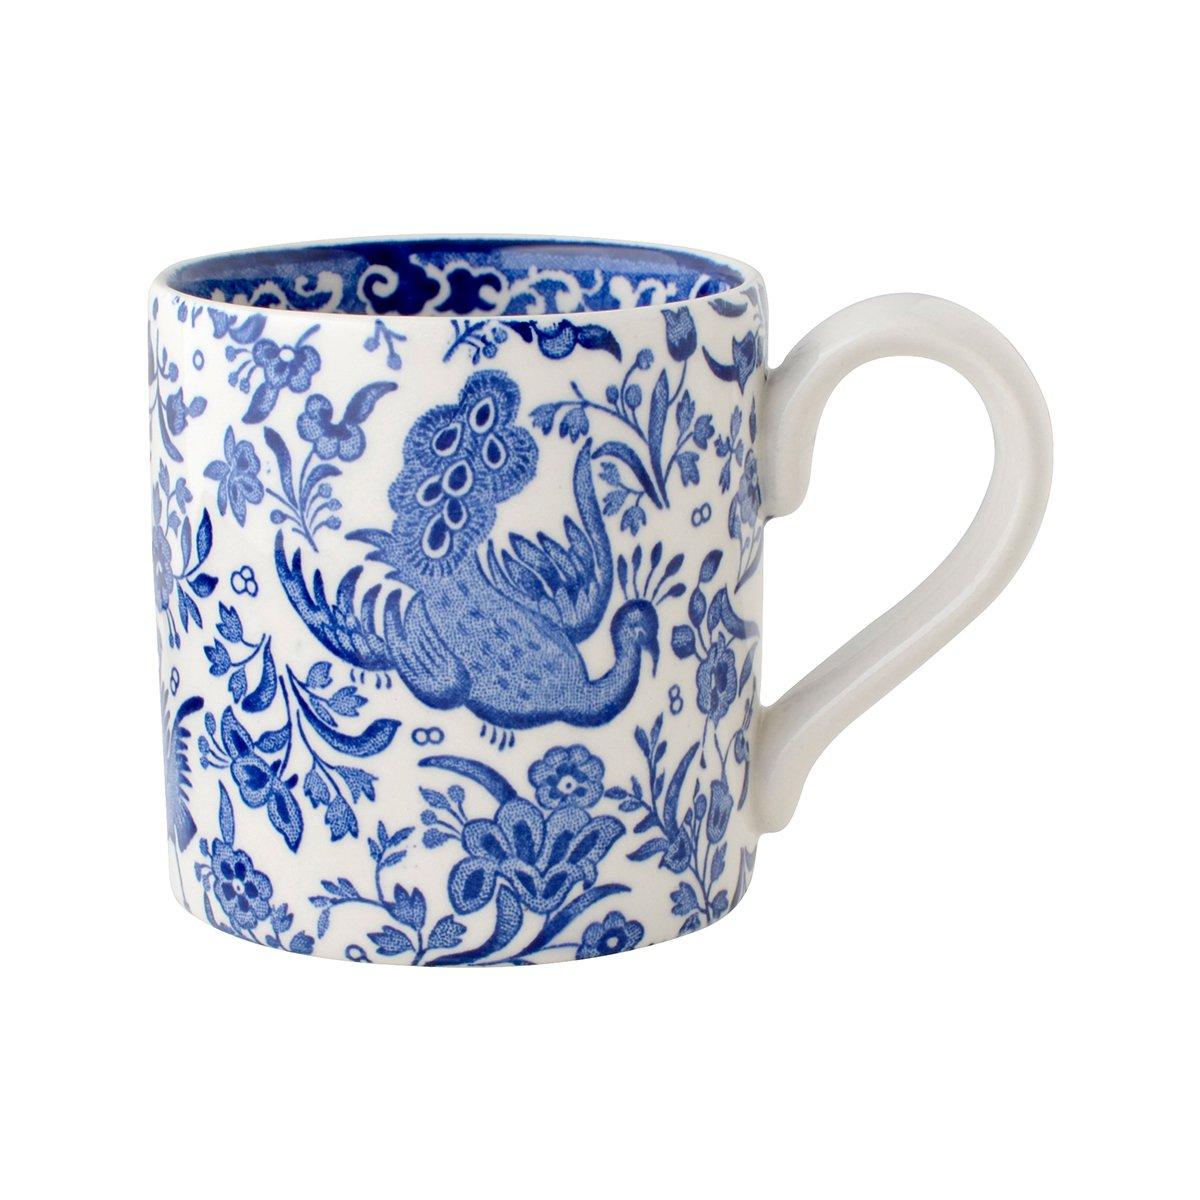 Burleigh(バーレイ) マグカップ 284ml <Blue Regal Peacock>ブルーリーガルピーコック 詳細画像1